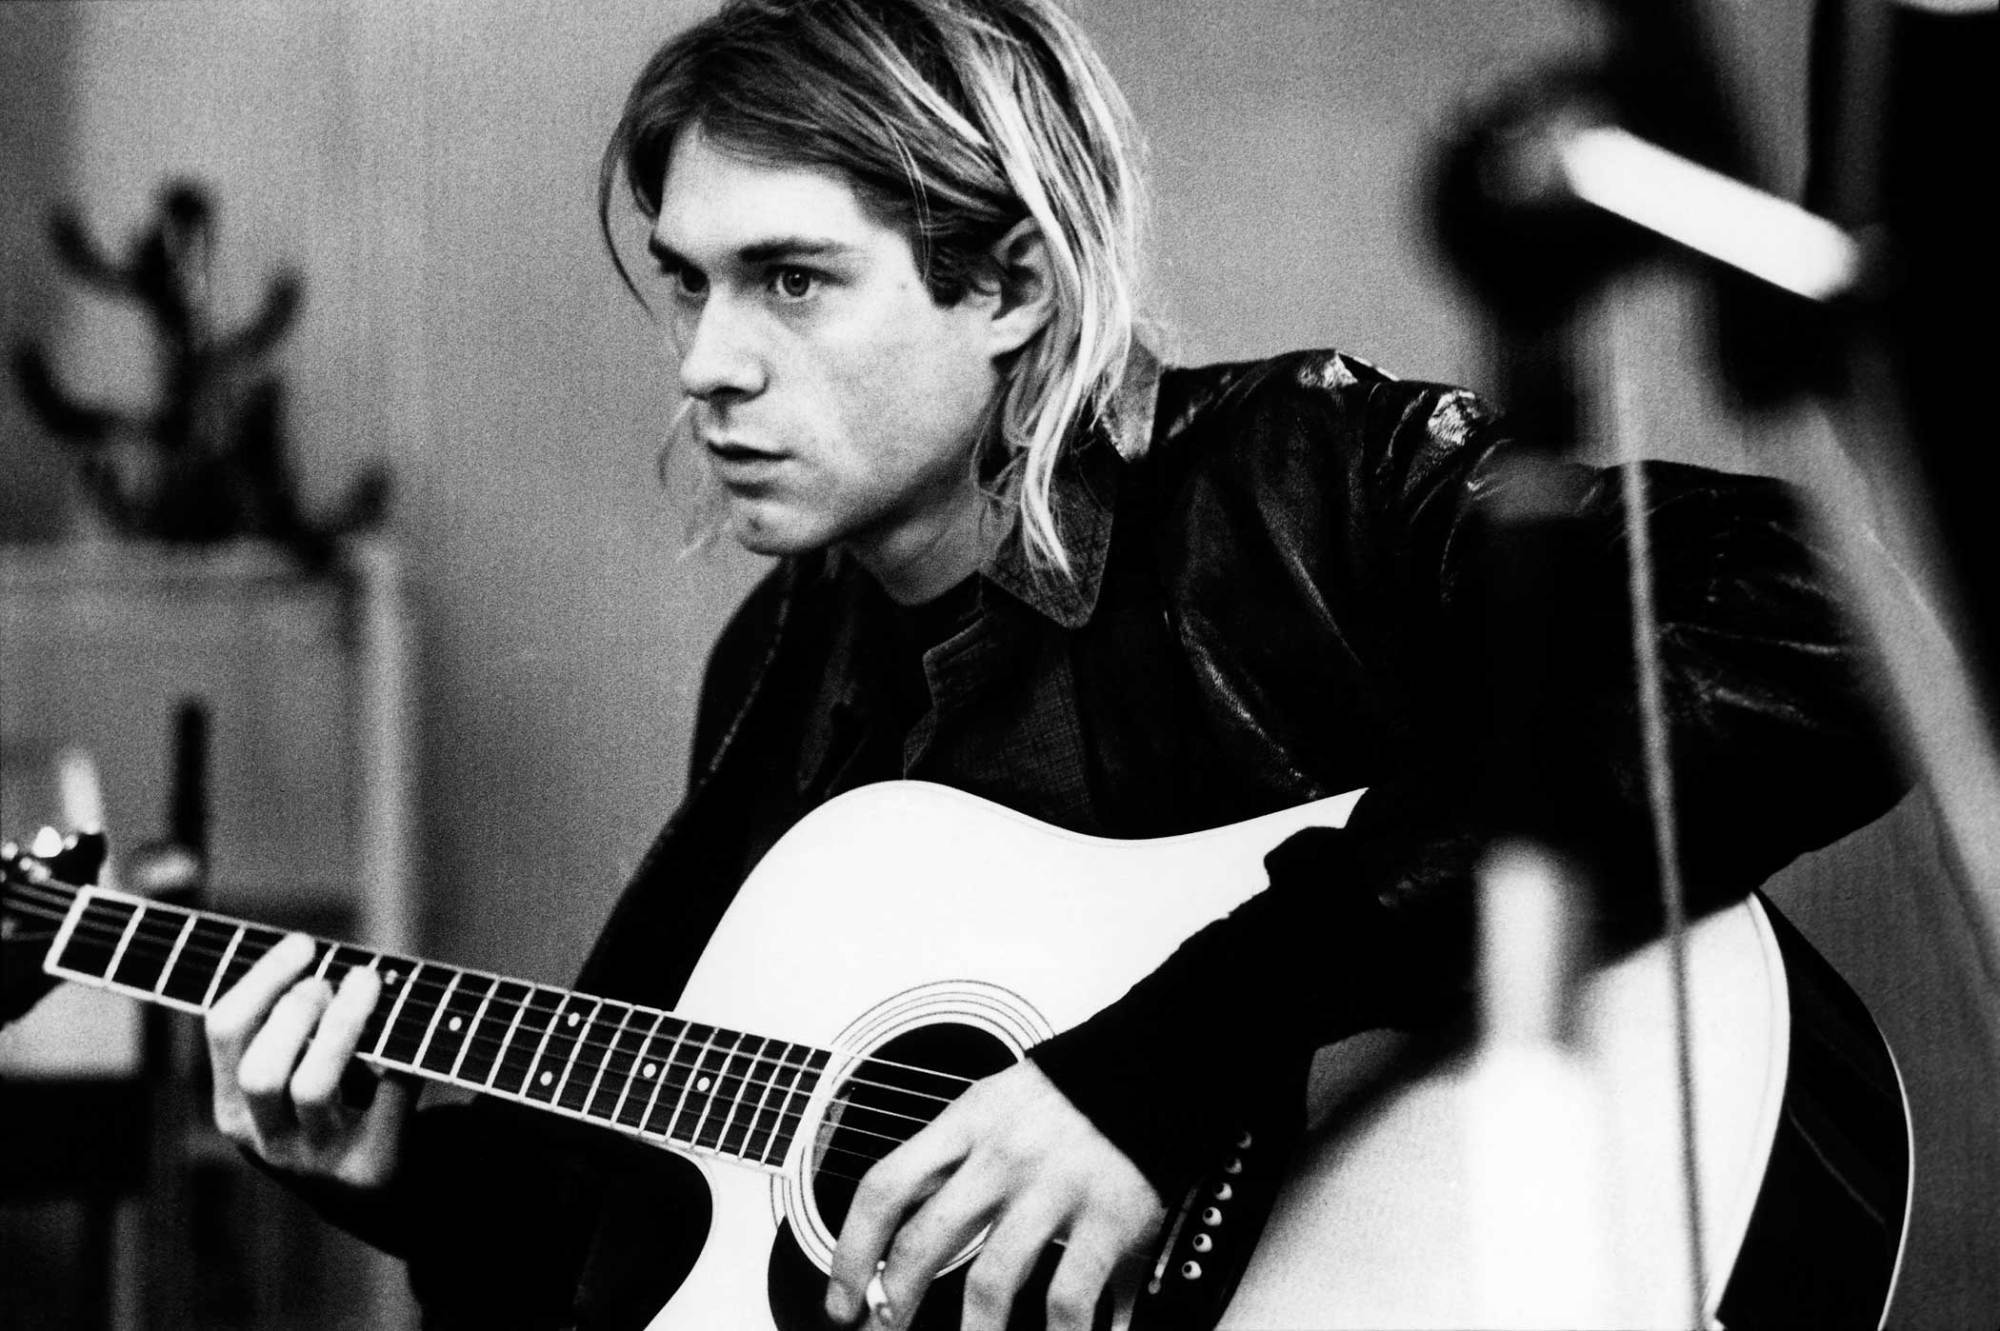 Kurt Cobain 486383   HD Wallpaper Backgrounds Download 2000x1331